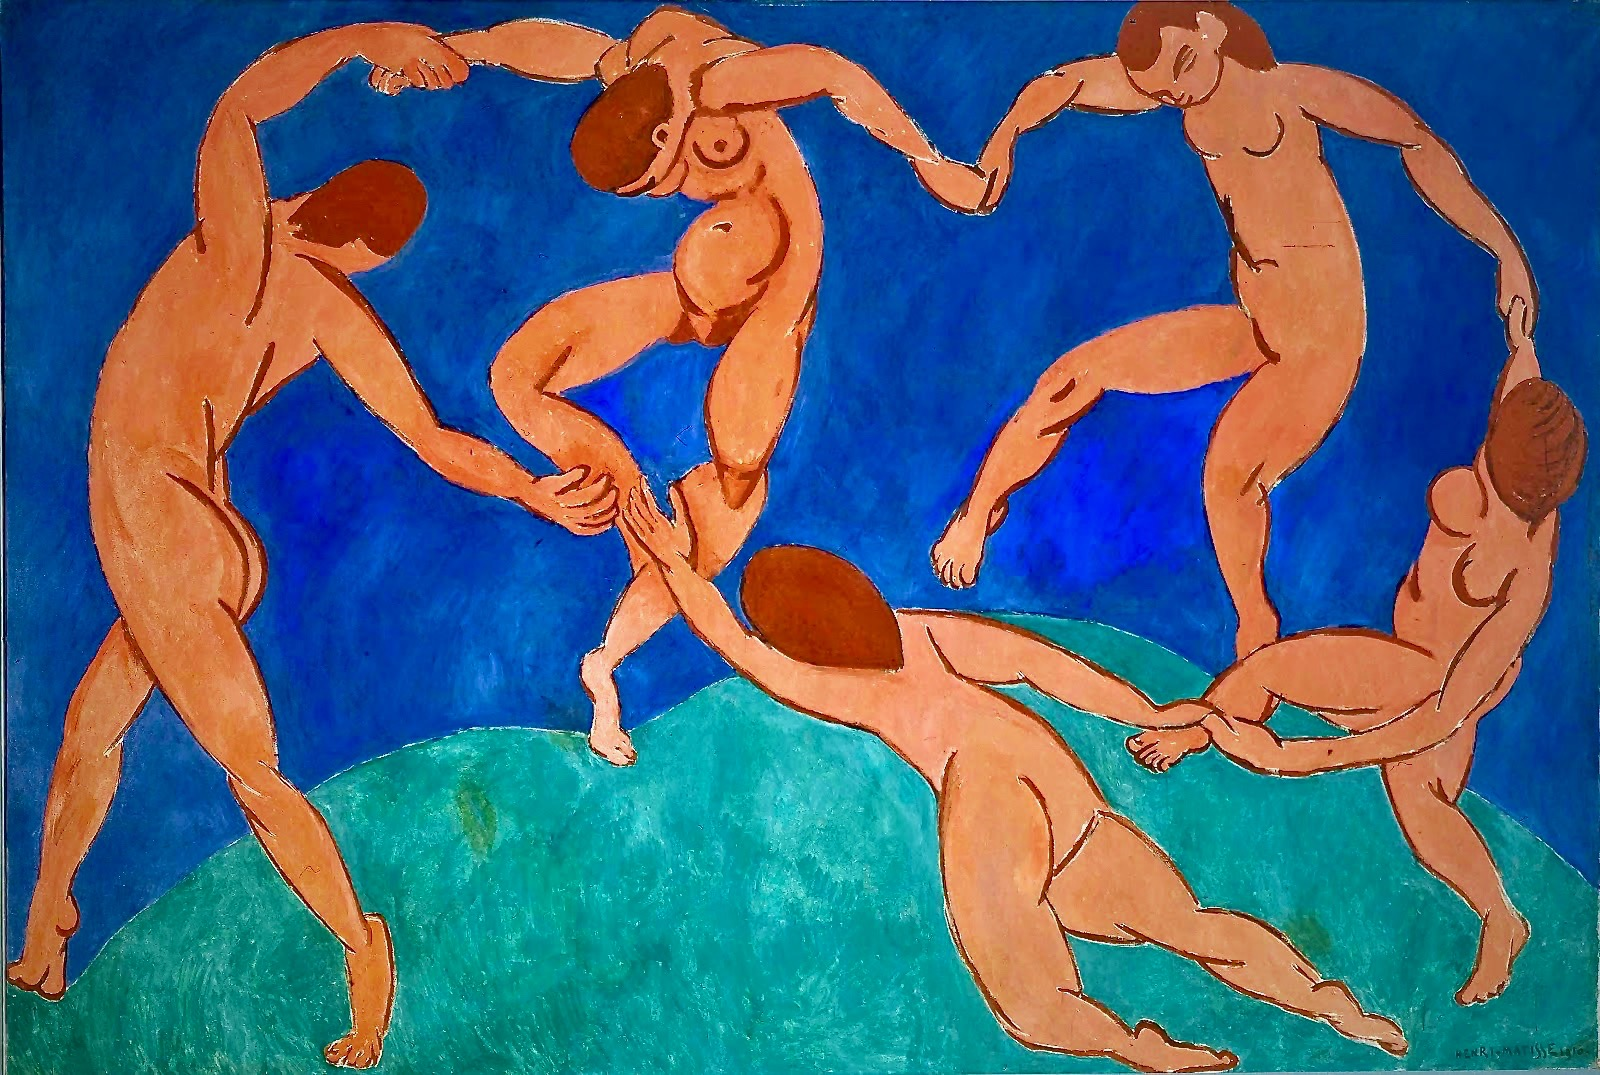 henri-matisse-la-danse-1908-saint-pc3a9tersbourg-ermitage